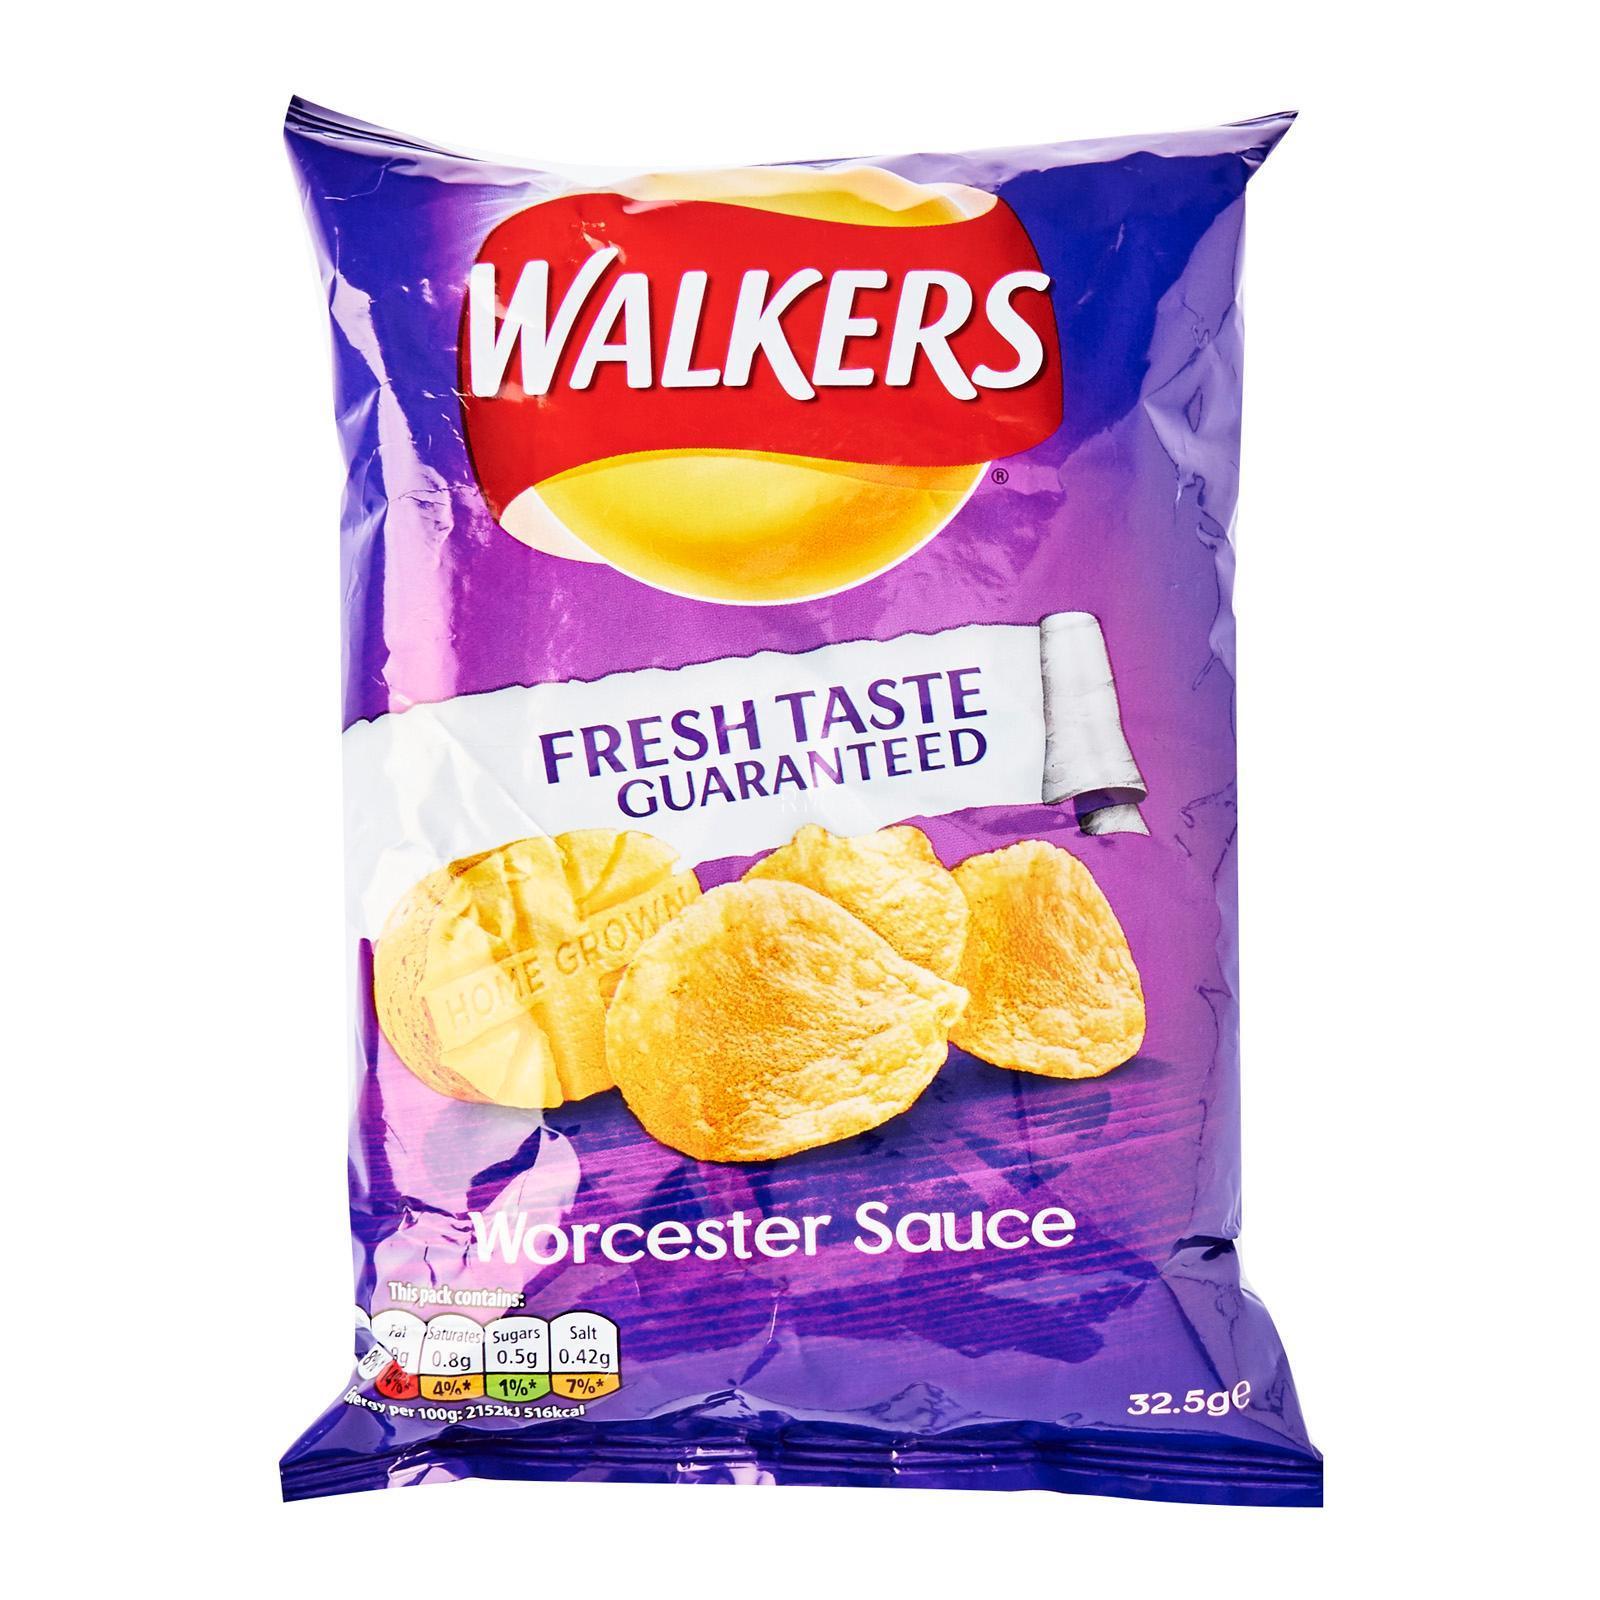 Walkers Worcester Sauce Crisp Buy Sell Online Potato Chips Crisps